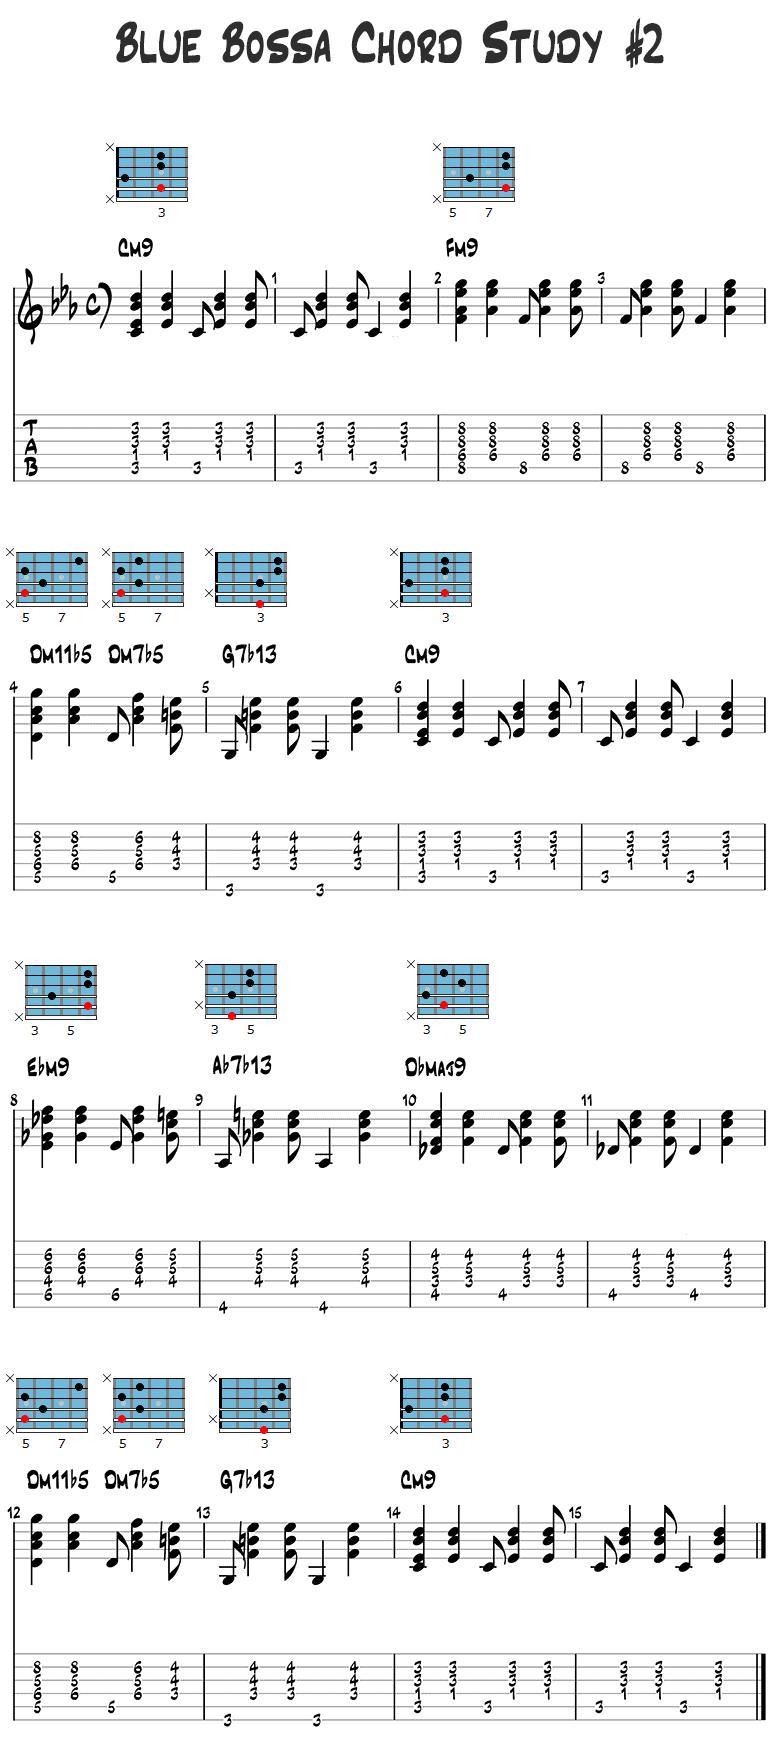 Blue Bossa Chord Study 2